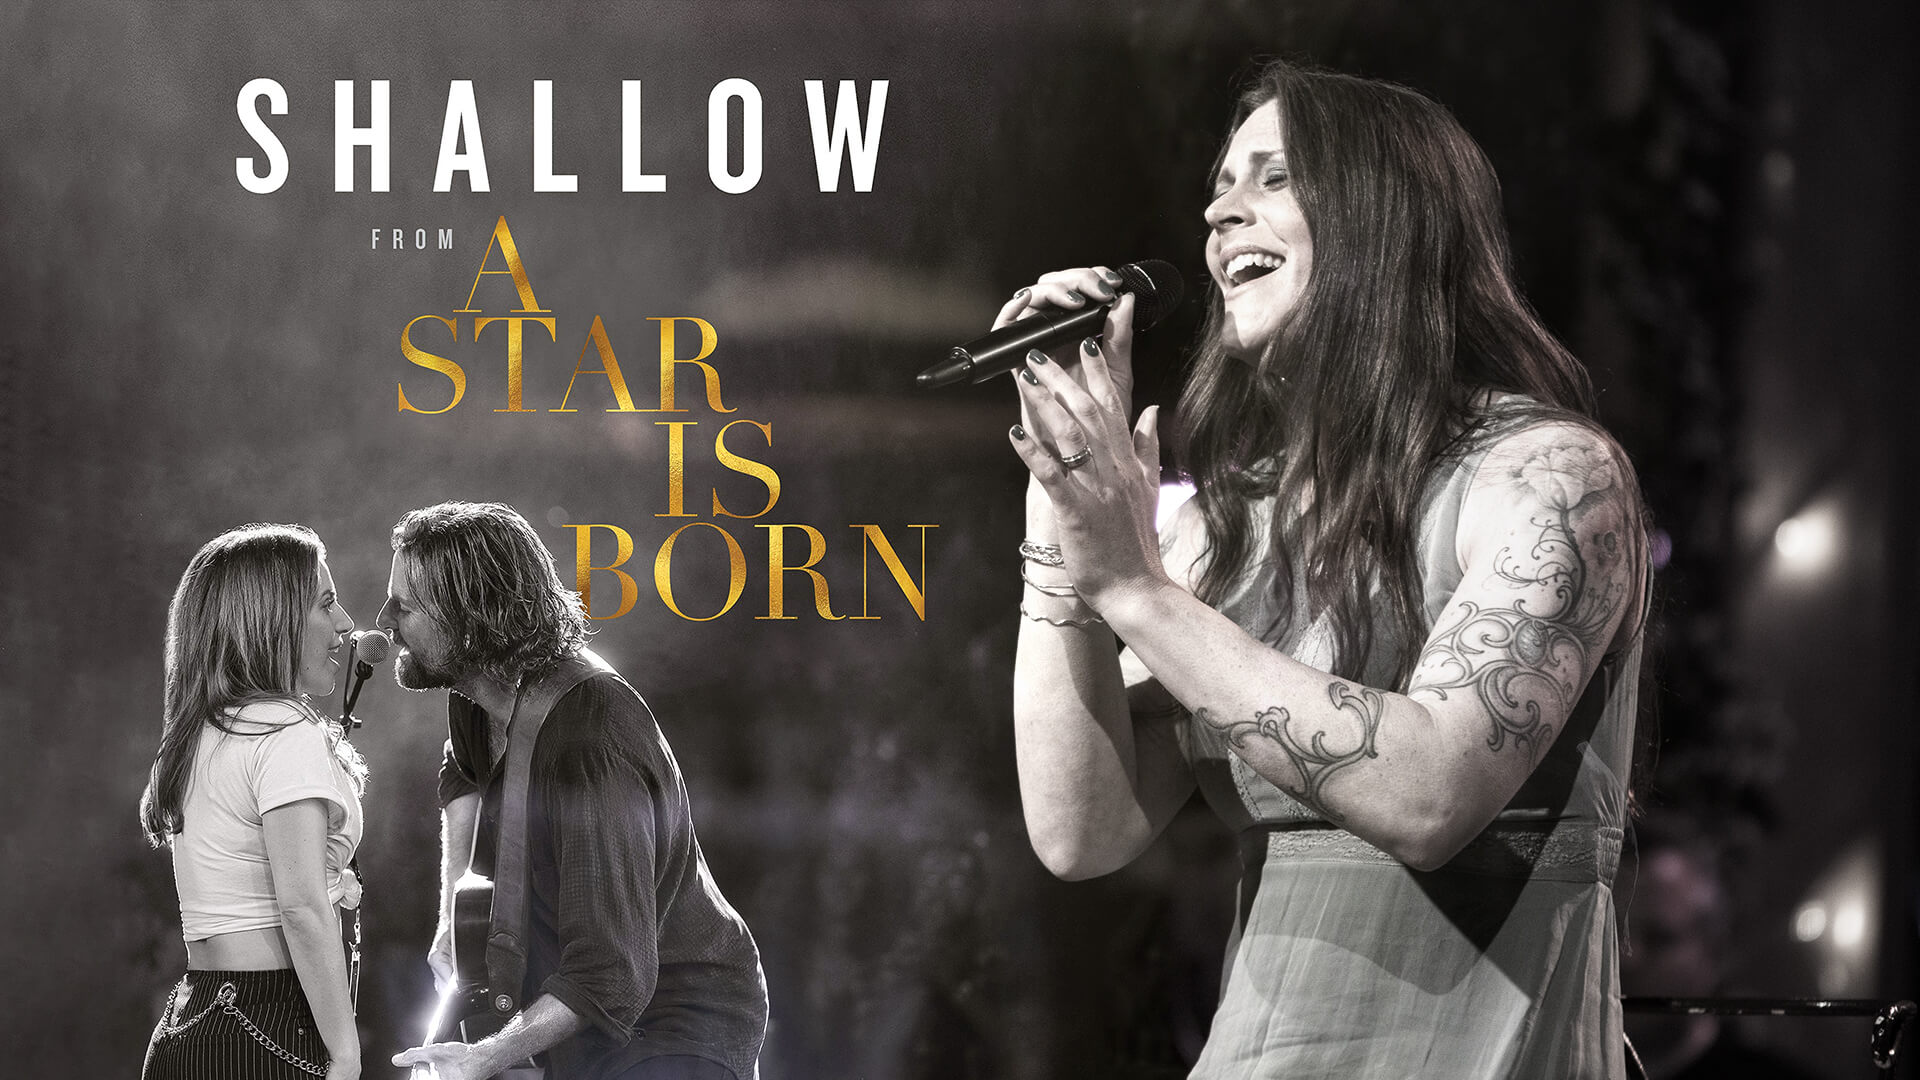 Floor Jansen Shallow A Star Is Born Lady Gaga